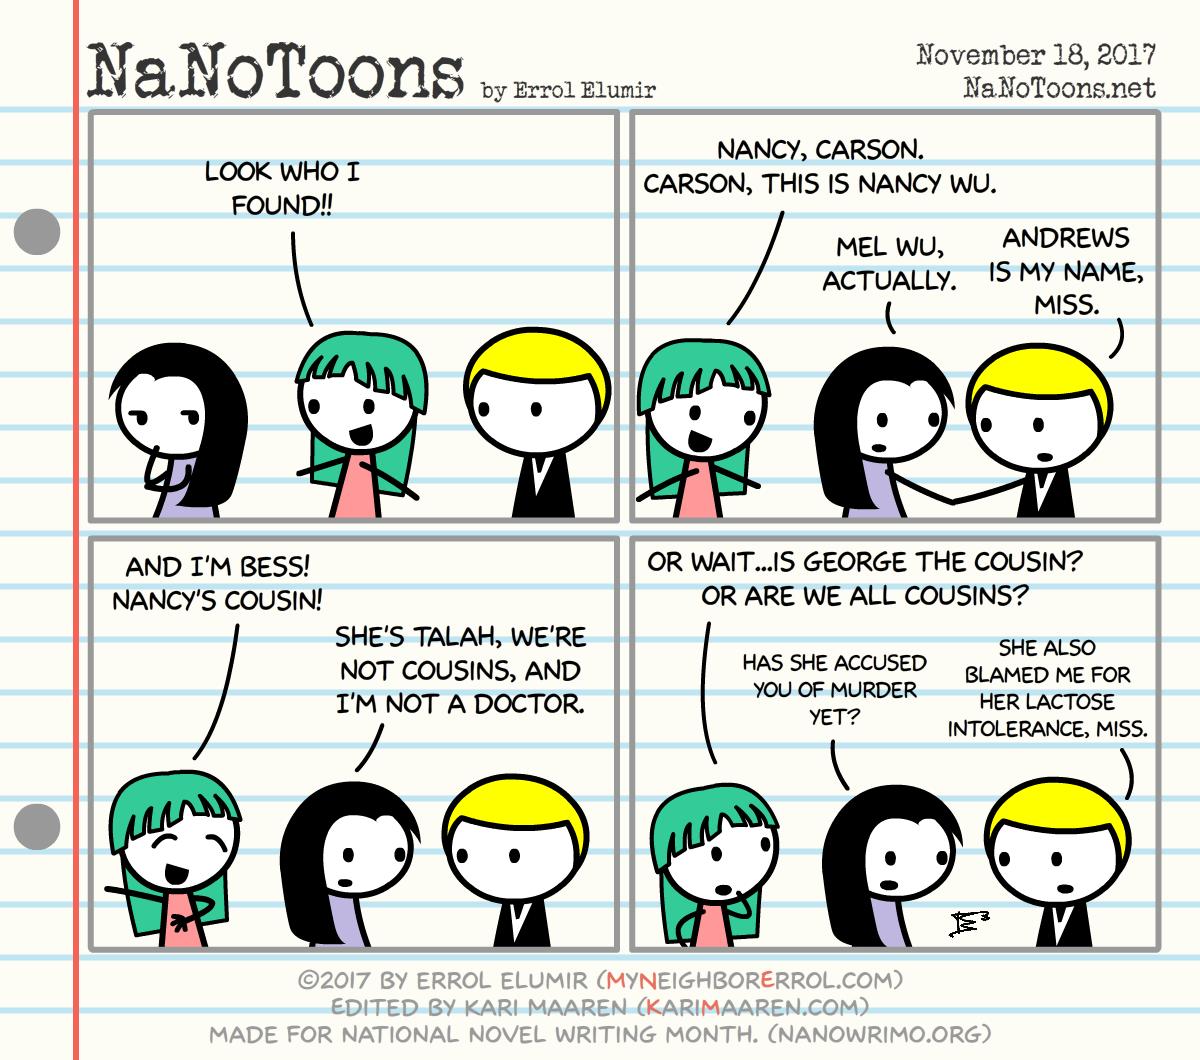 NaNoToons_2017_10_18